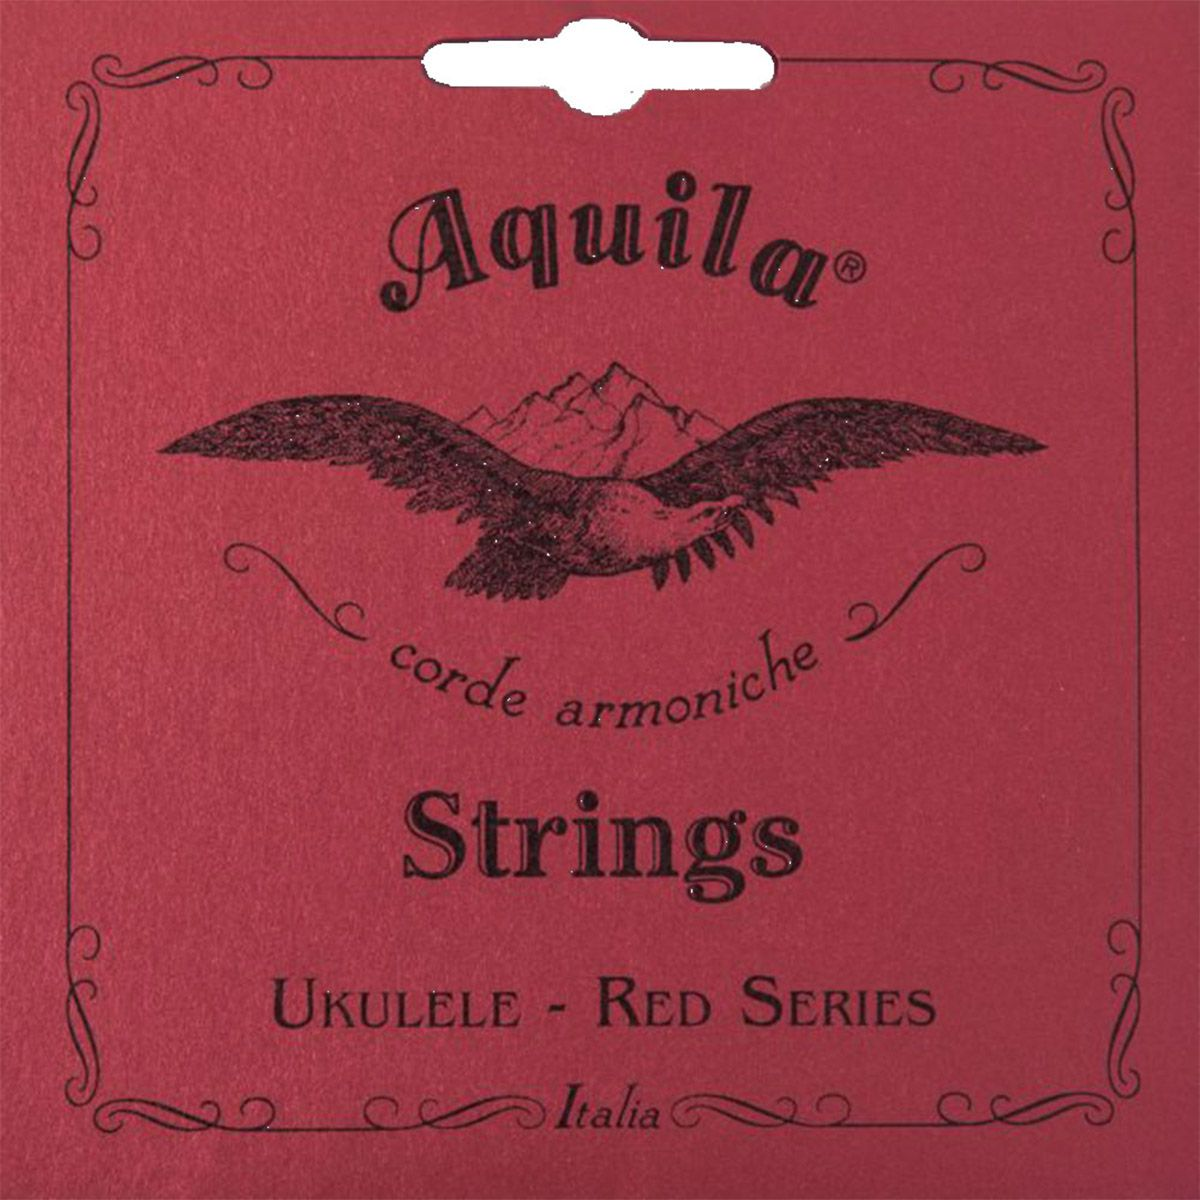 Encordoamento Aquila 87U Red Series High G Ukulele Tenor